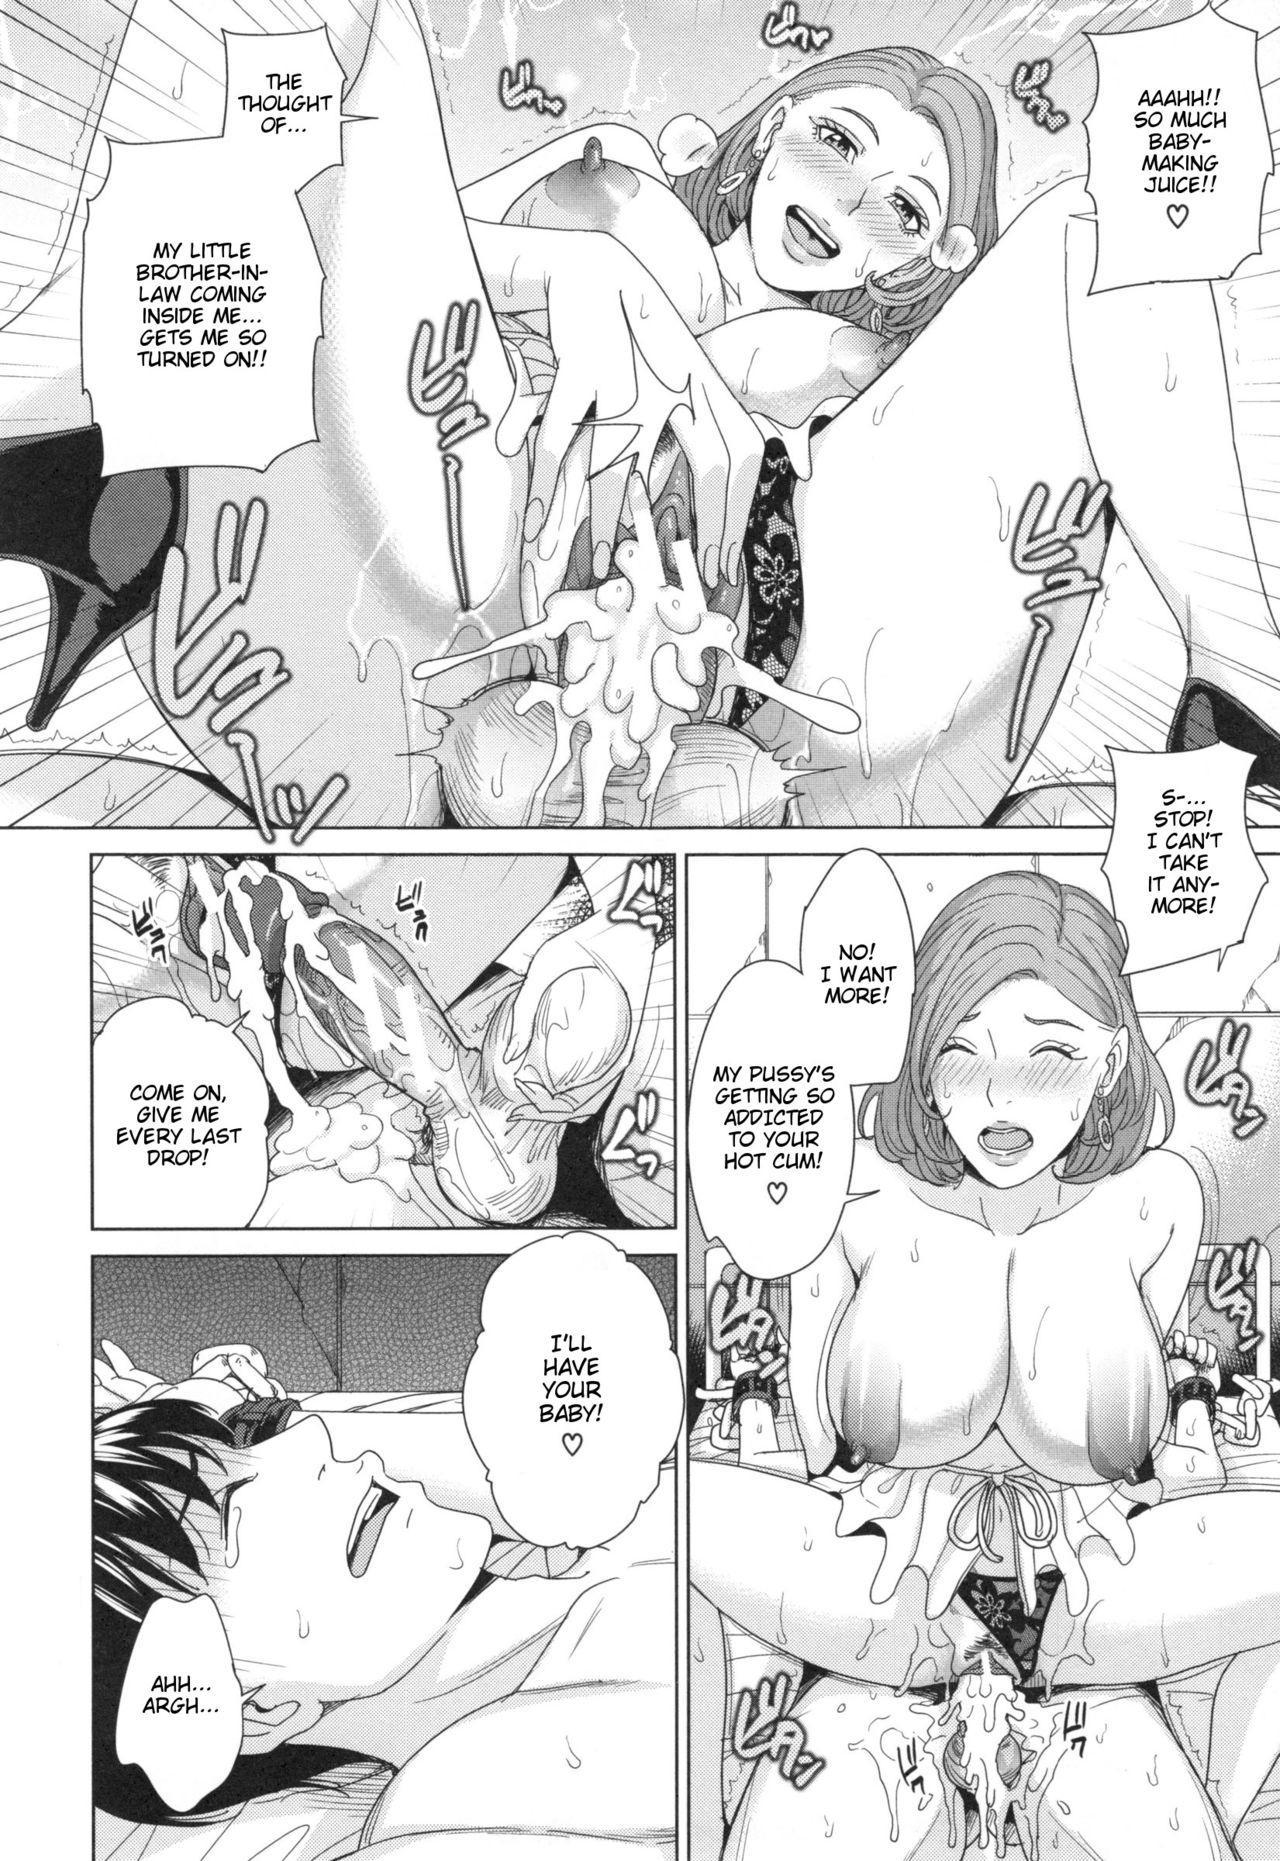 [Maimu-Maimu] Aniyome Bitch Life | Sister-in-Law Slut Life [English] {Taihen Zombii} 60